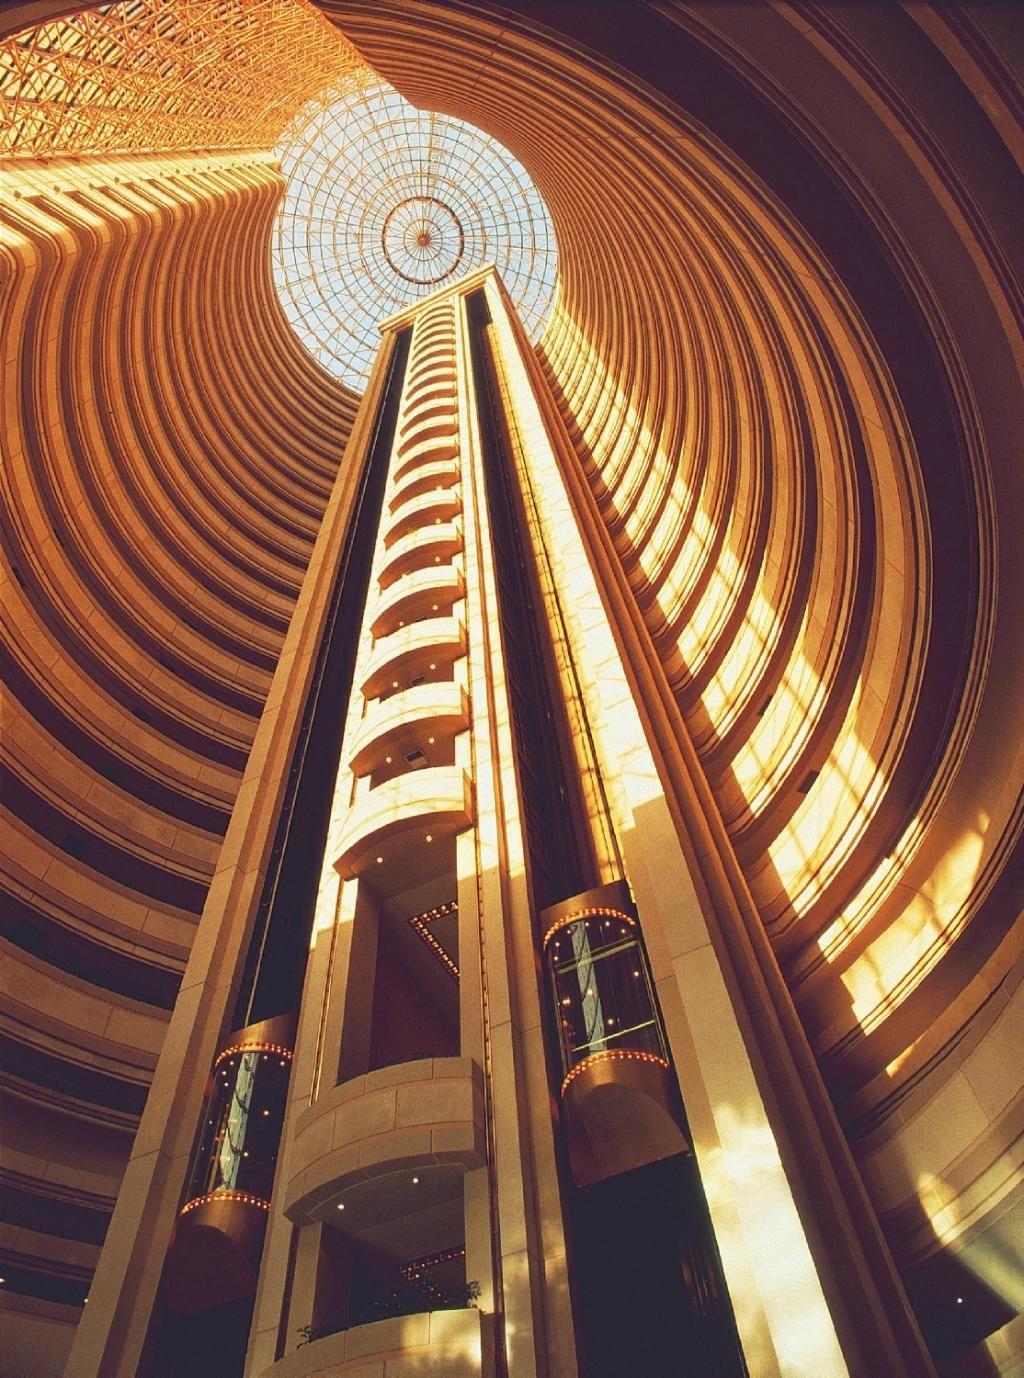 Grand Hyatt Santiago Chile Hotel Reviews Tripadvisor Grand